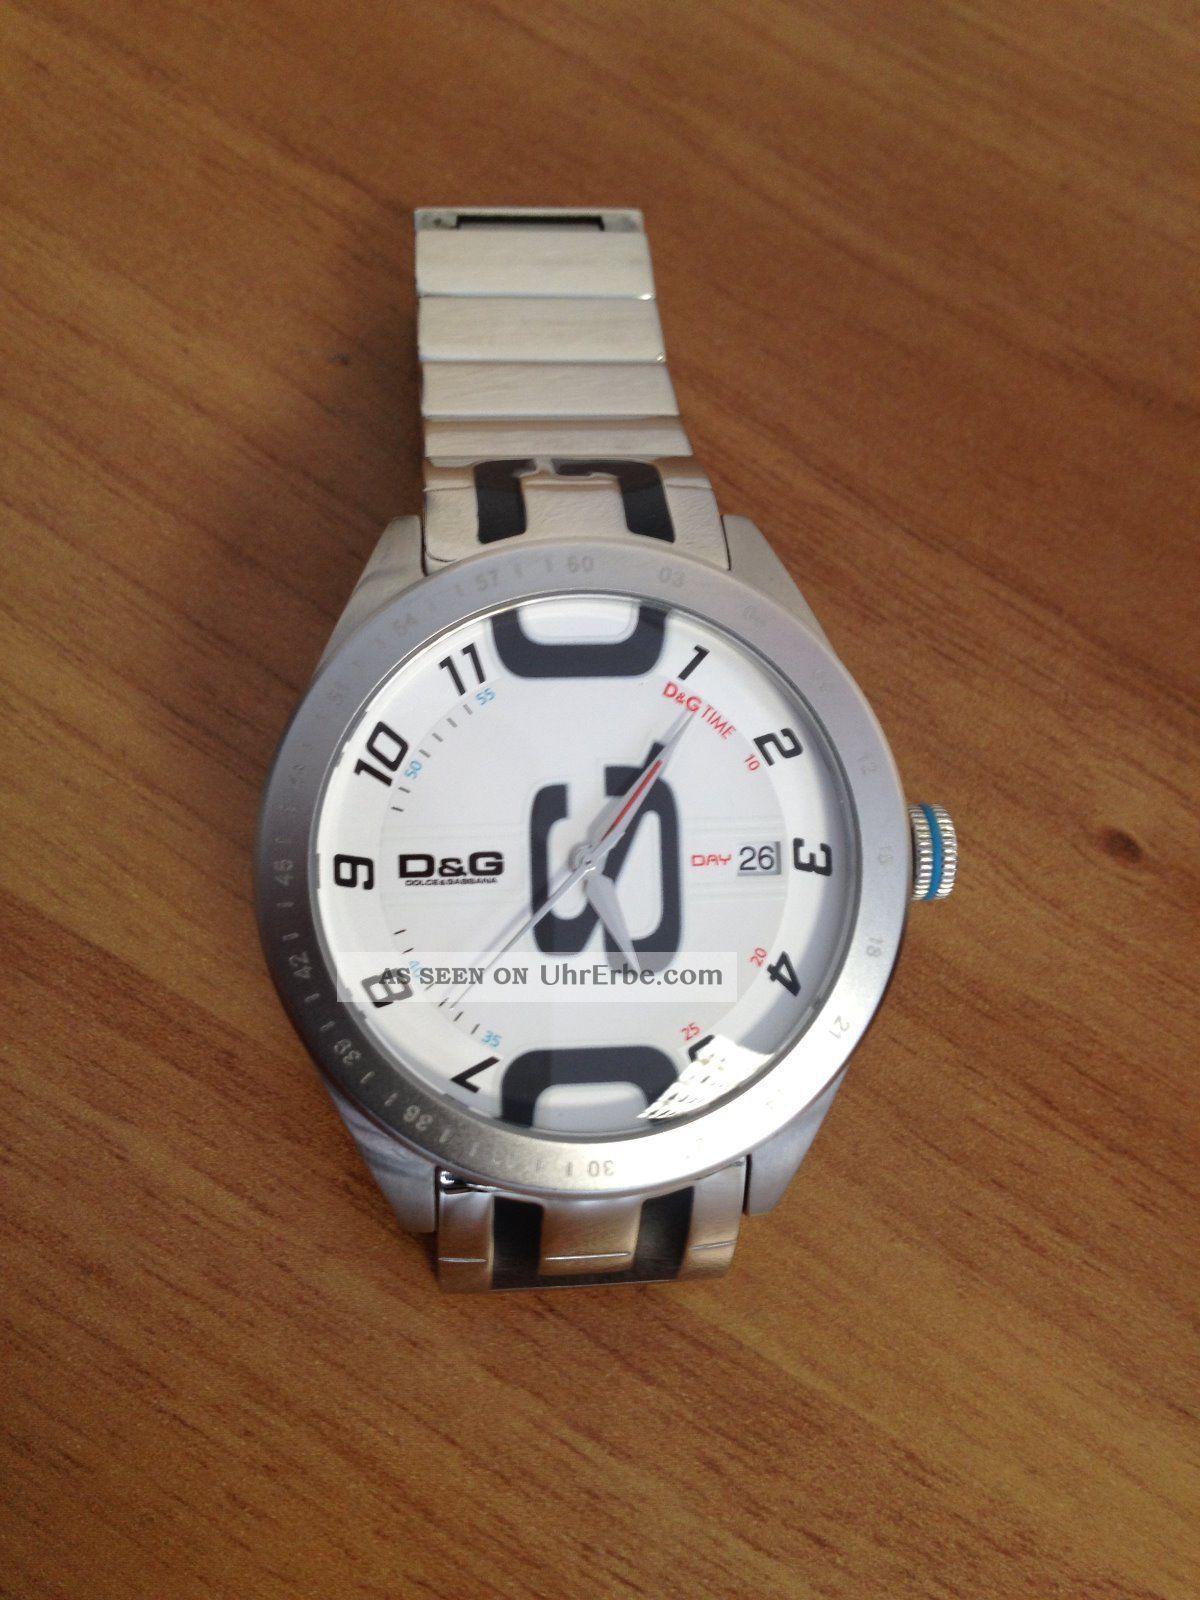 Dolce & Gabbana Armbanduhr Für Herren - Top Armbanduhren Bild